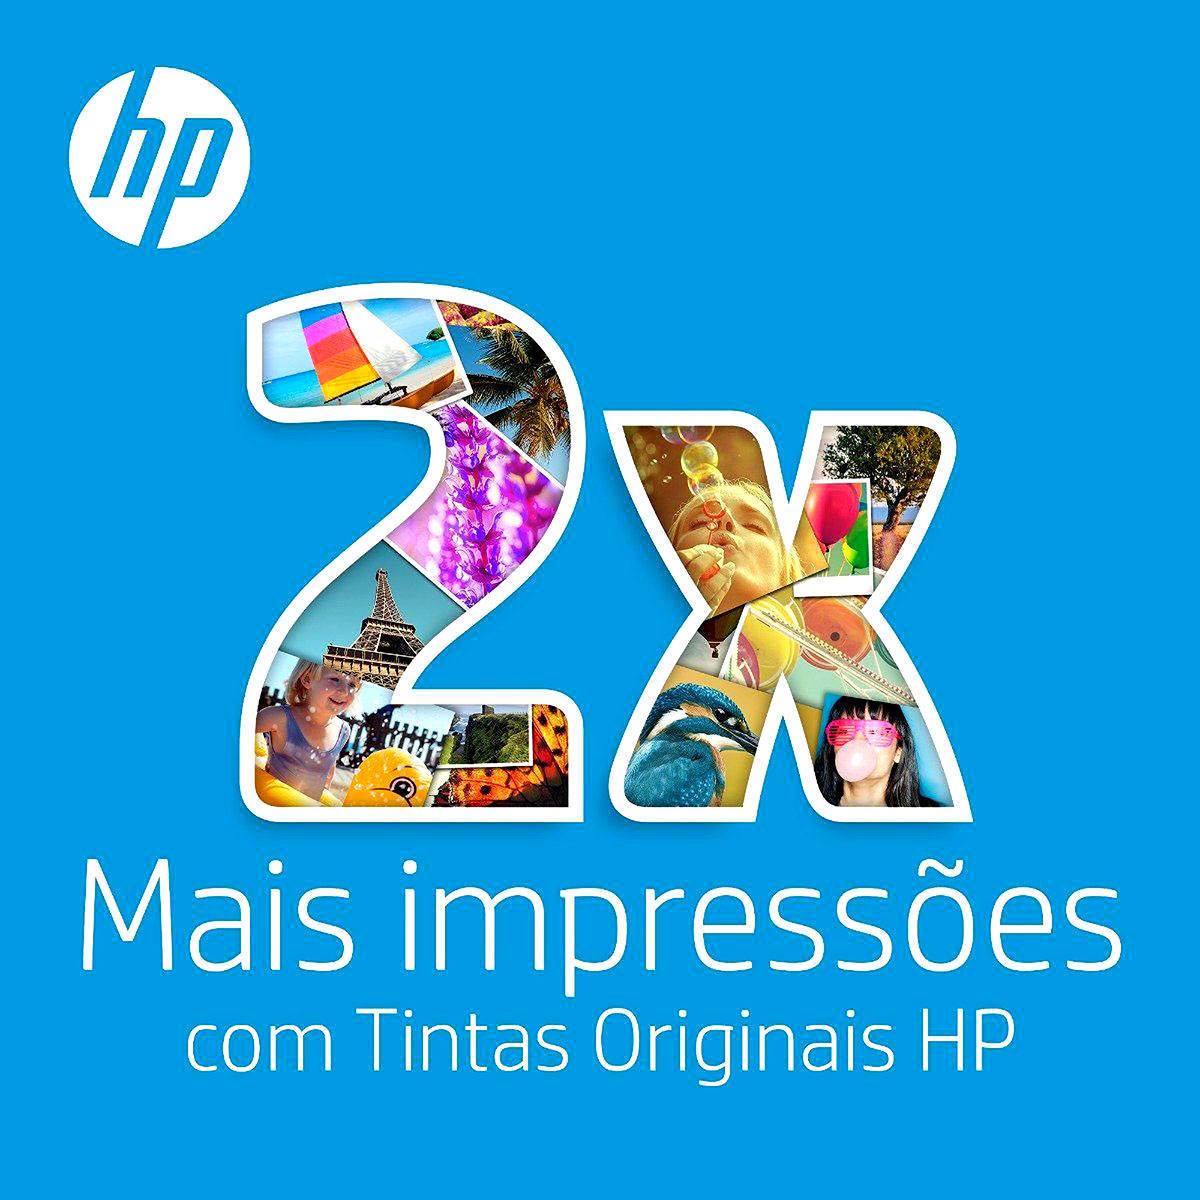 Kit Cartucho de Tinta HP 664XL Preto + 664XL Colorido para HP Deskjet 1115 2136 2676 4676 5276 Original Alto Rendimento